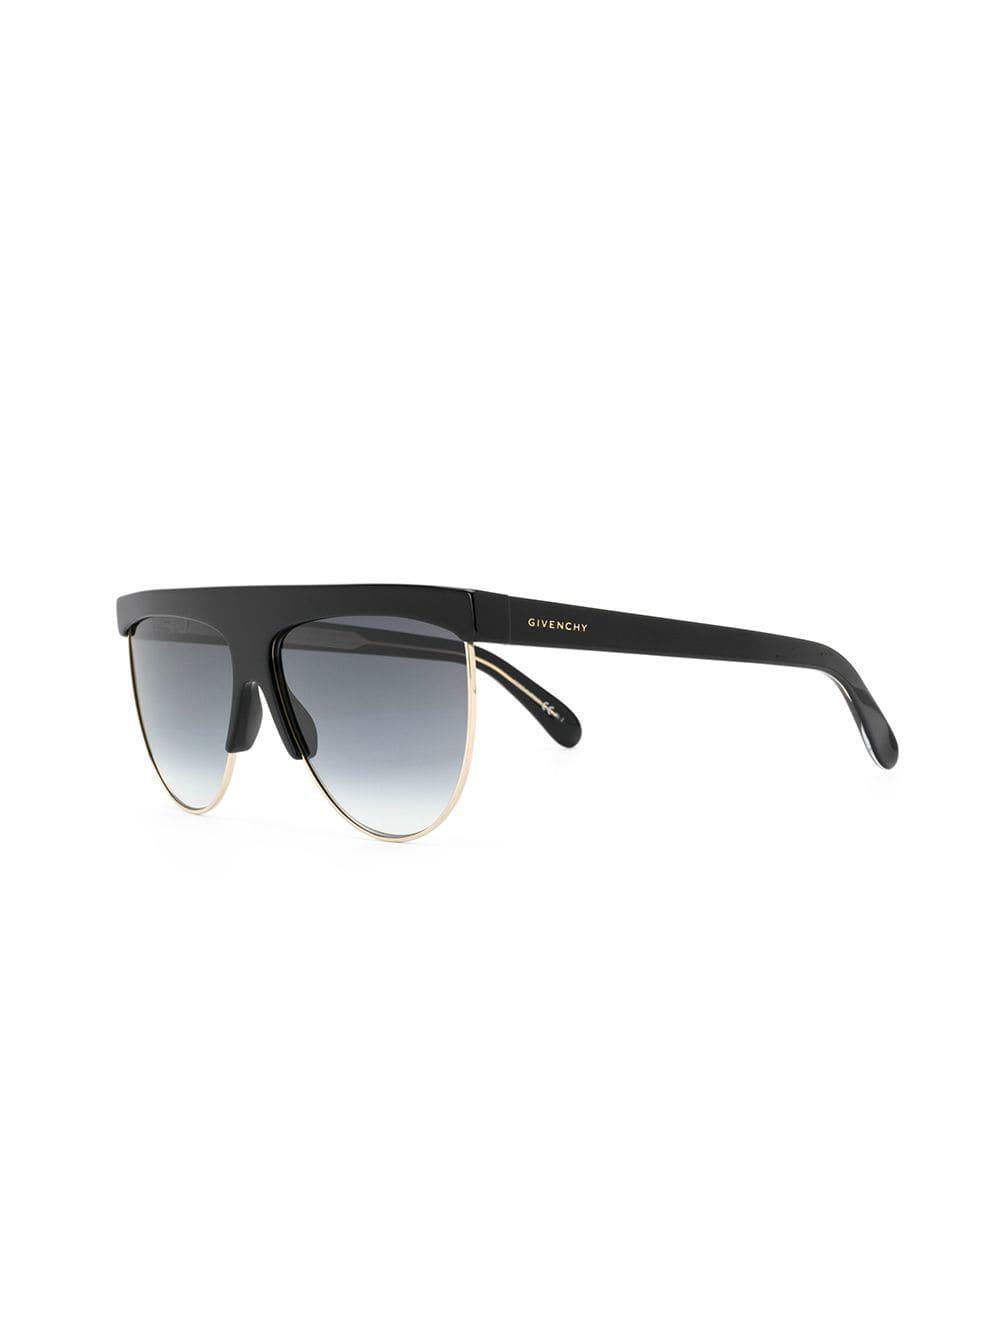 10e55388dd Givenchy Gv7118 g s Sunglasses in Black - Lyst